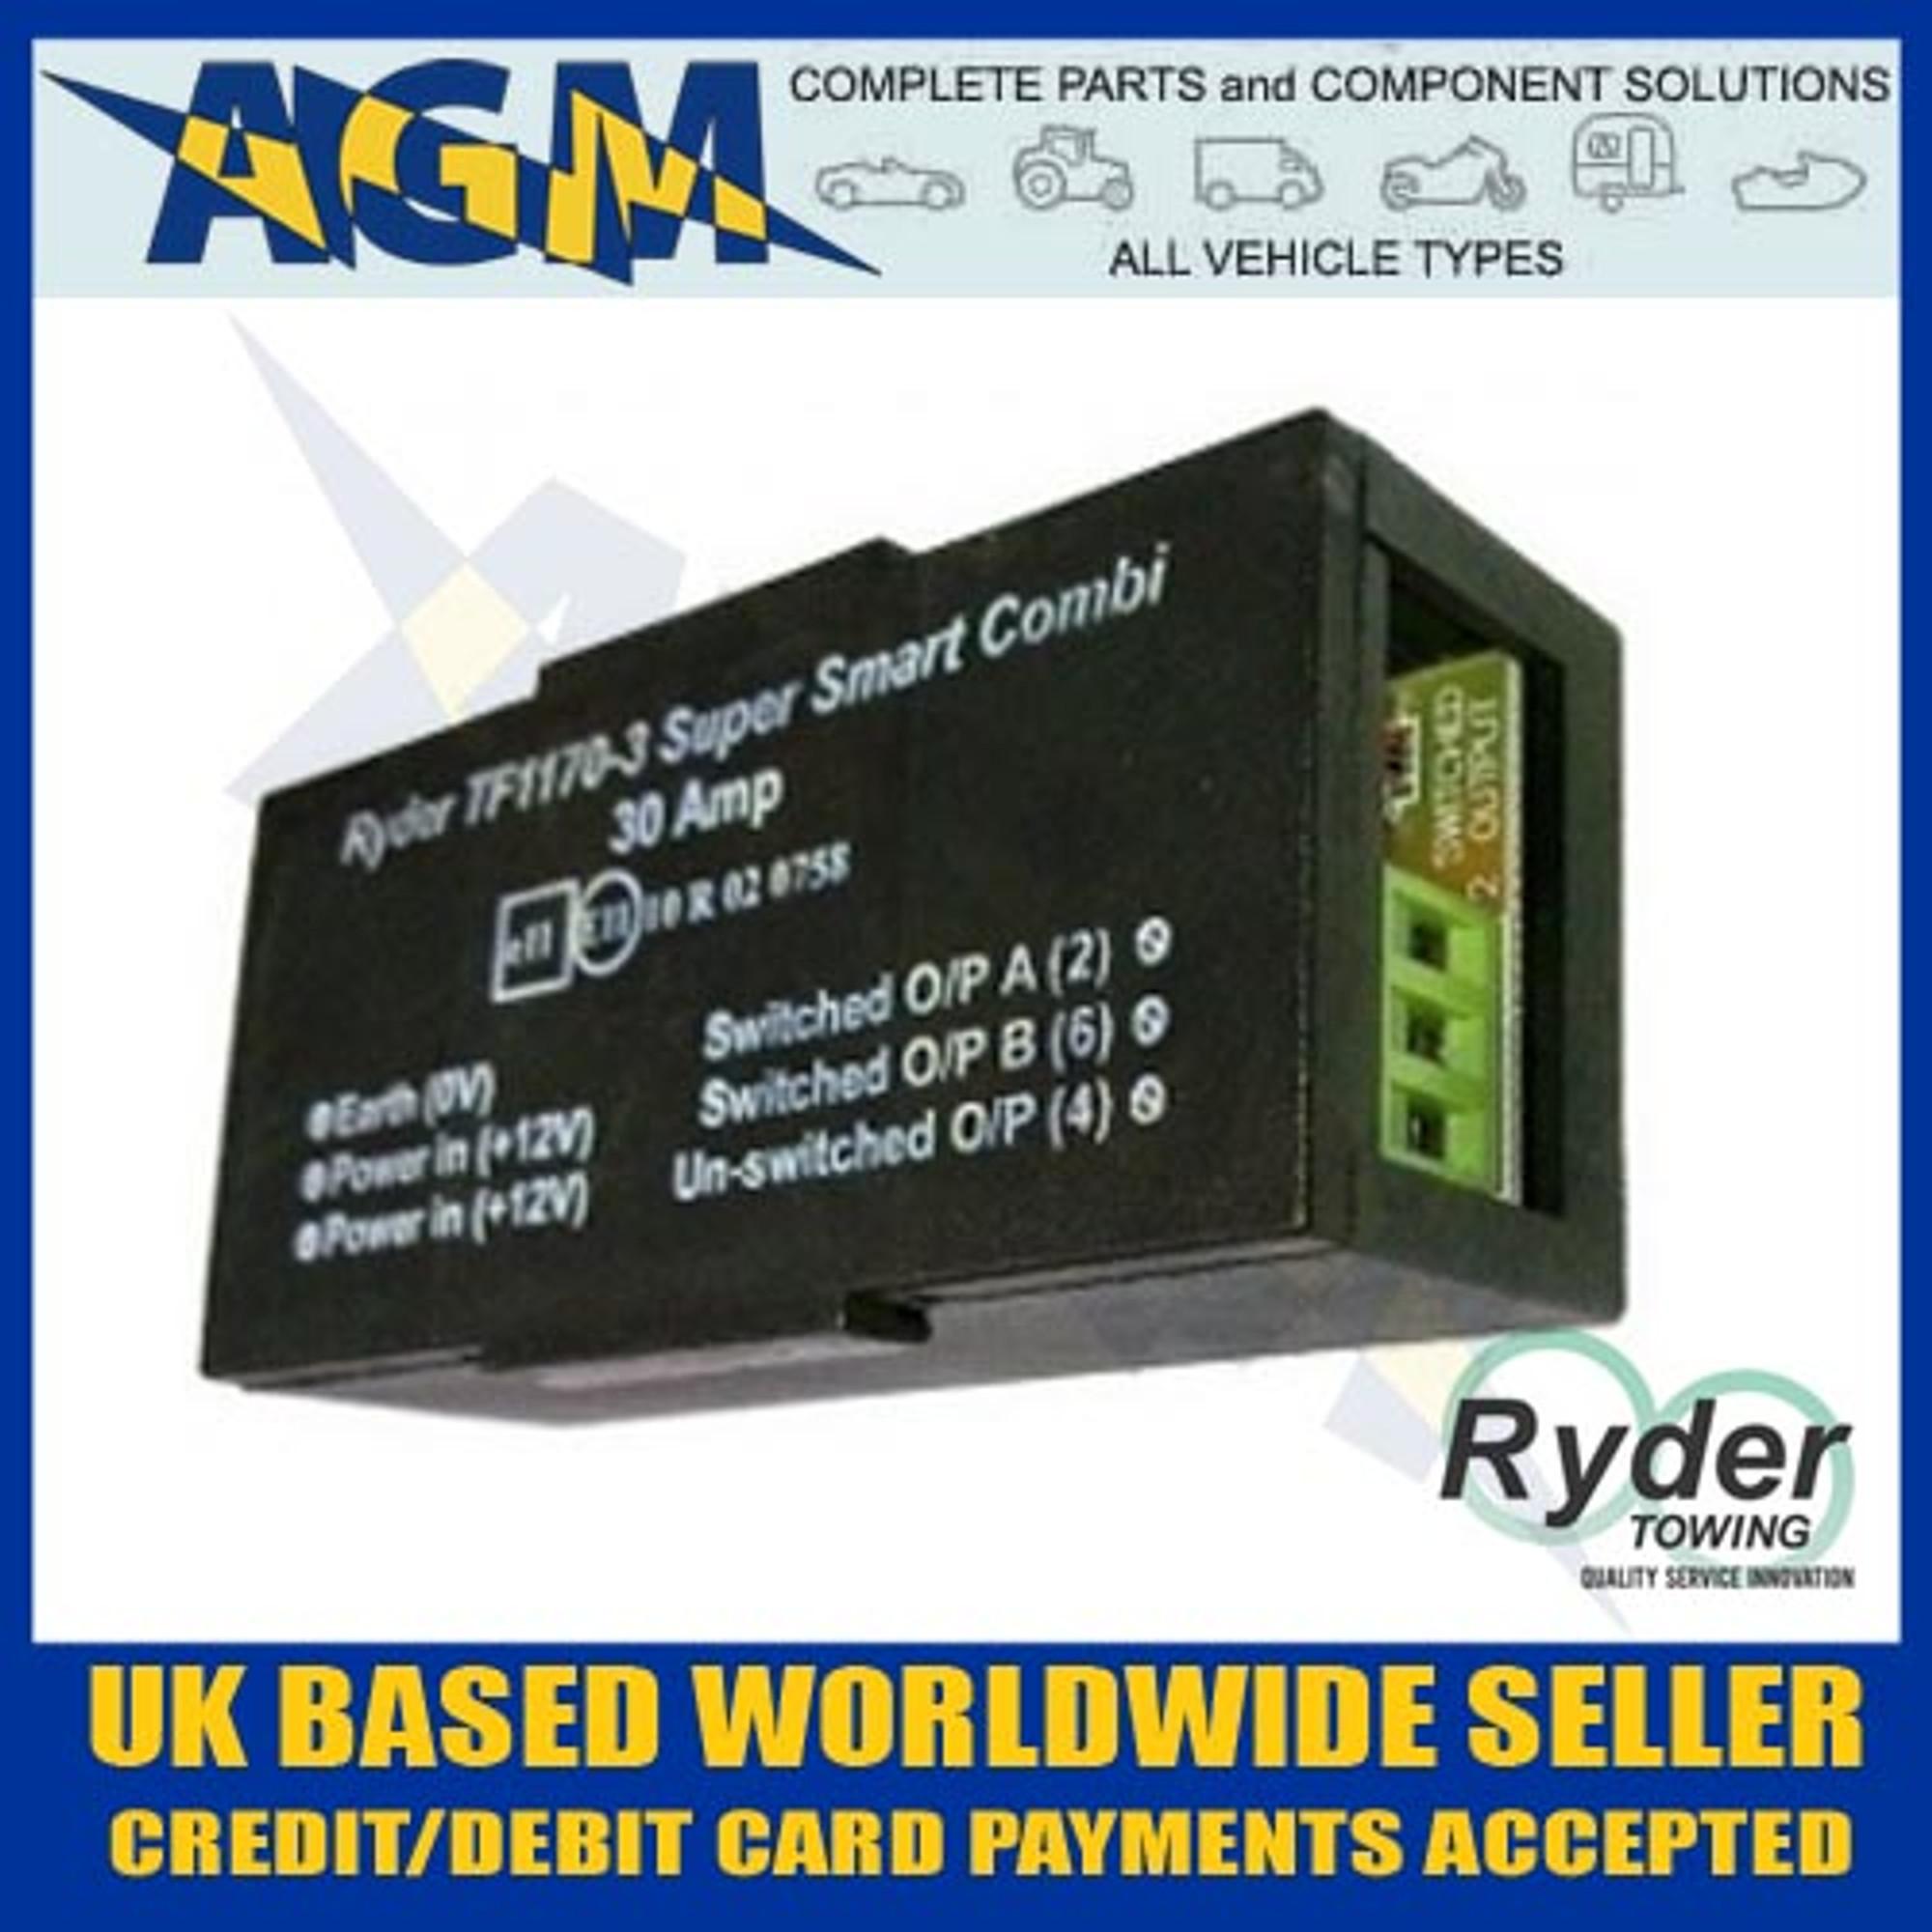 Ryder super smart combi caravan split charge towing relay 30 amp ryder tf1170 3 smart combi caravan split charge towing relay 30 amp asfbconference2016 Gallery